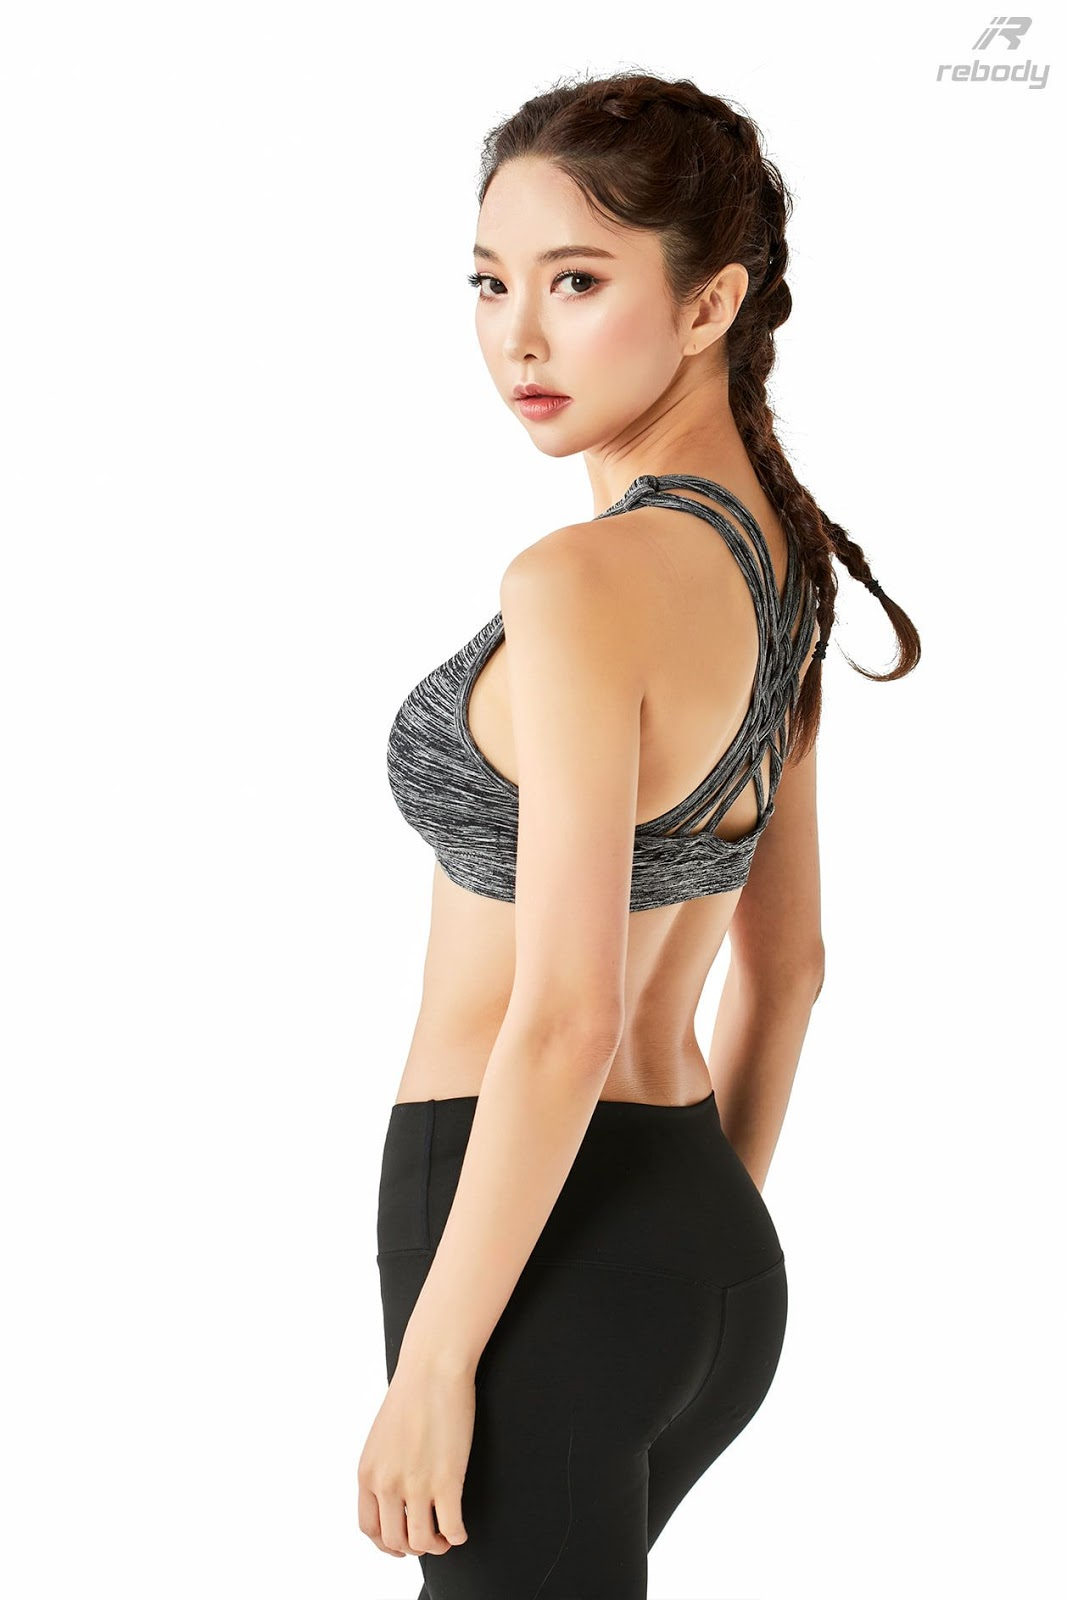 Park Soo Yeon - Sports Bra Fitness Set - Korean fashion model - Picture 8